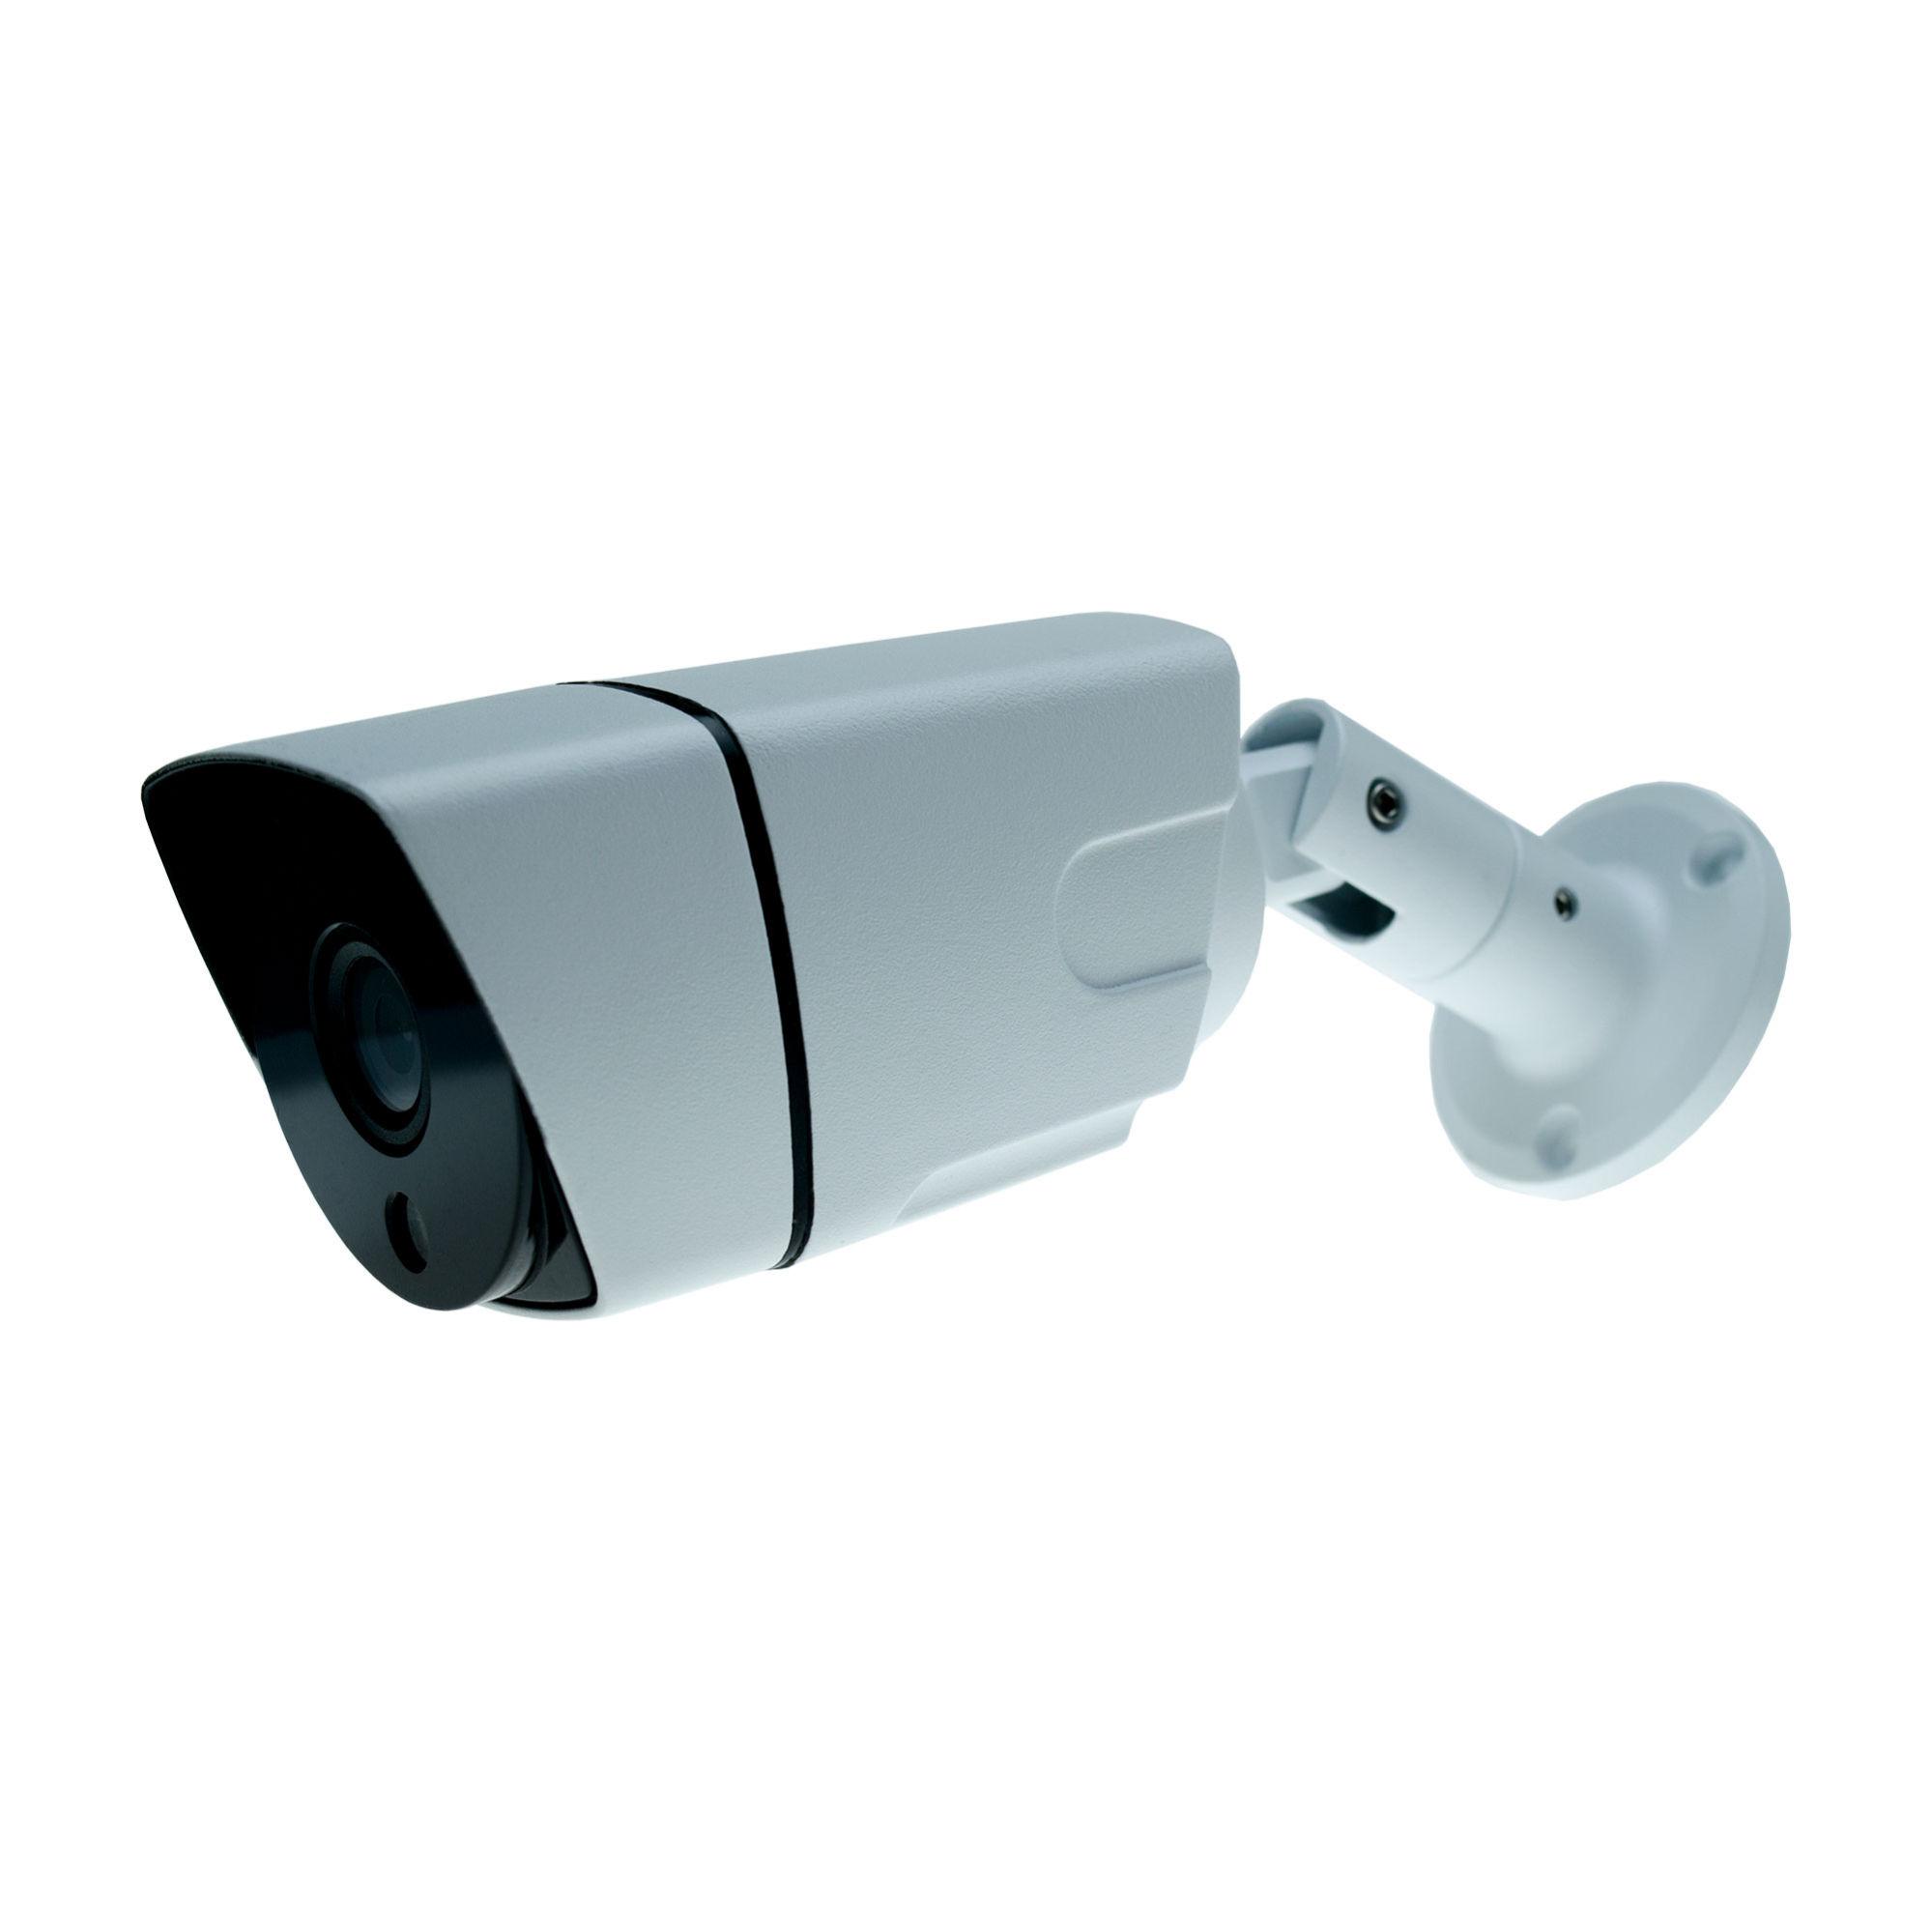 Camera supraveghere 1080p AHD/TVI/CVI/CVBS all-in-one